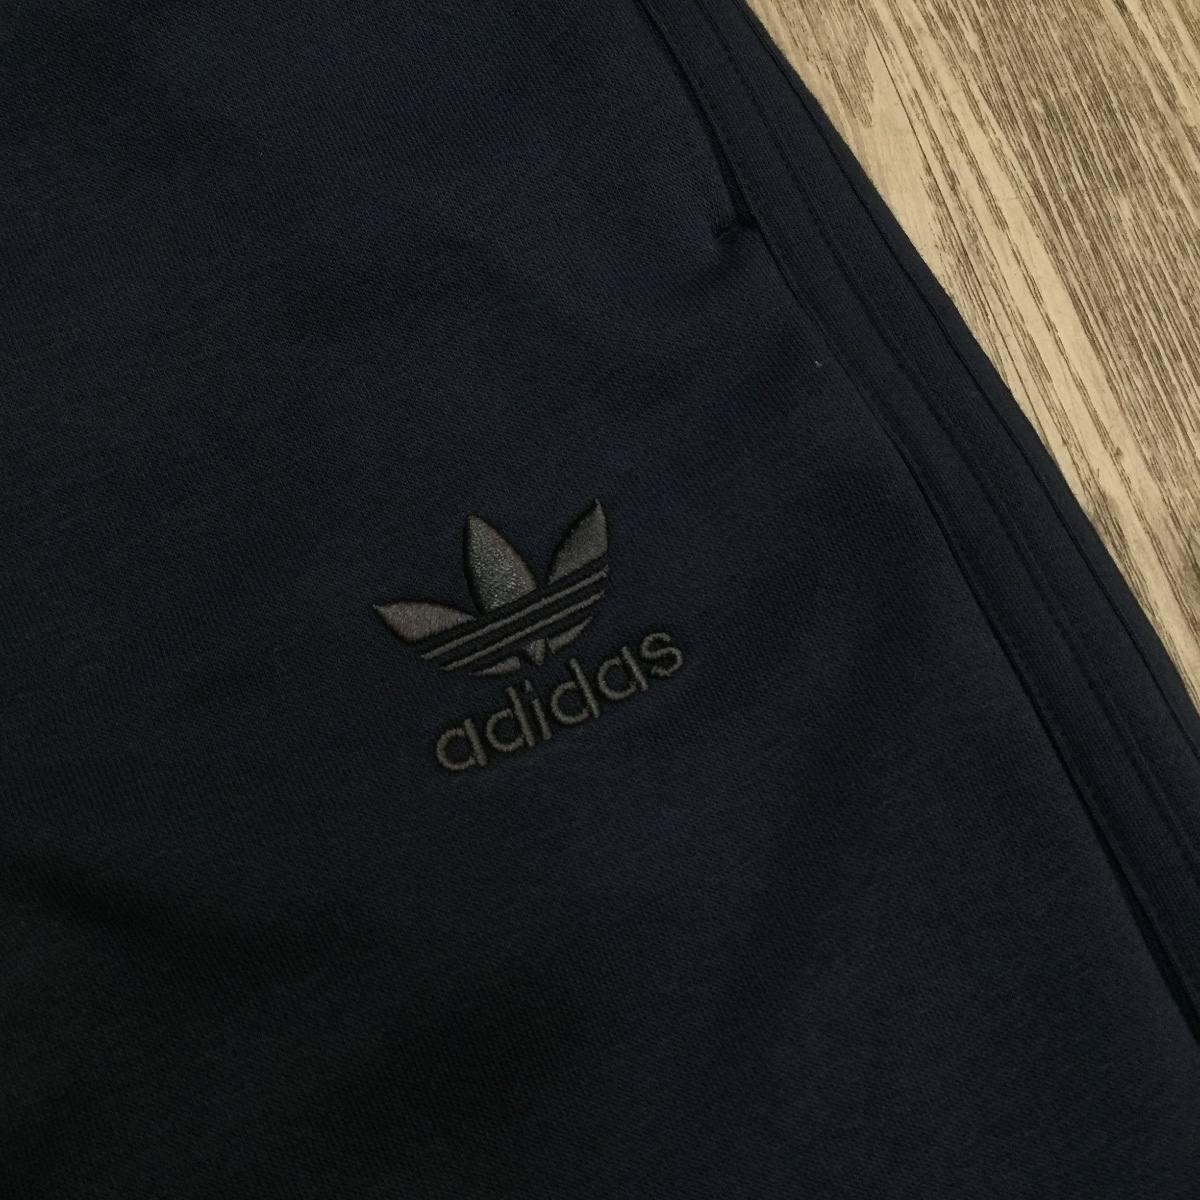 d869361e4eef8 pants adidas originals azul marino hombre bk5907 look trendy. Cargando zoom.